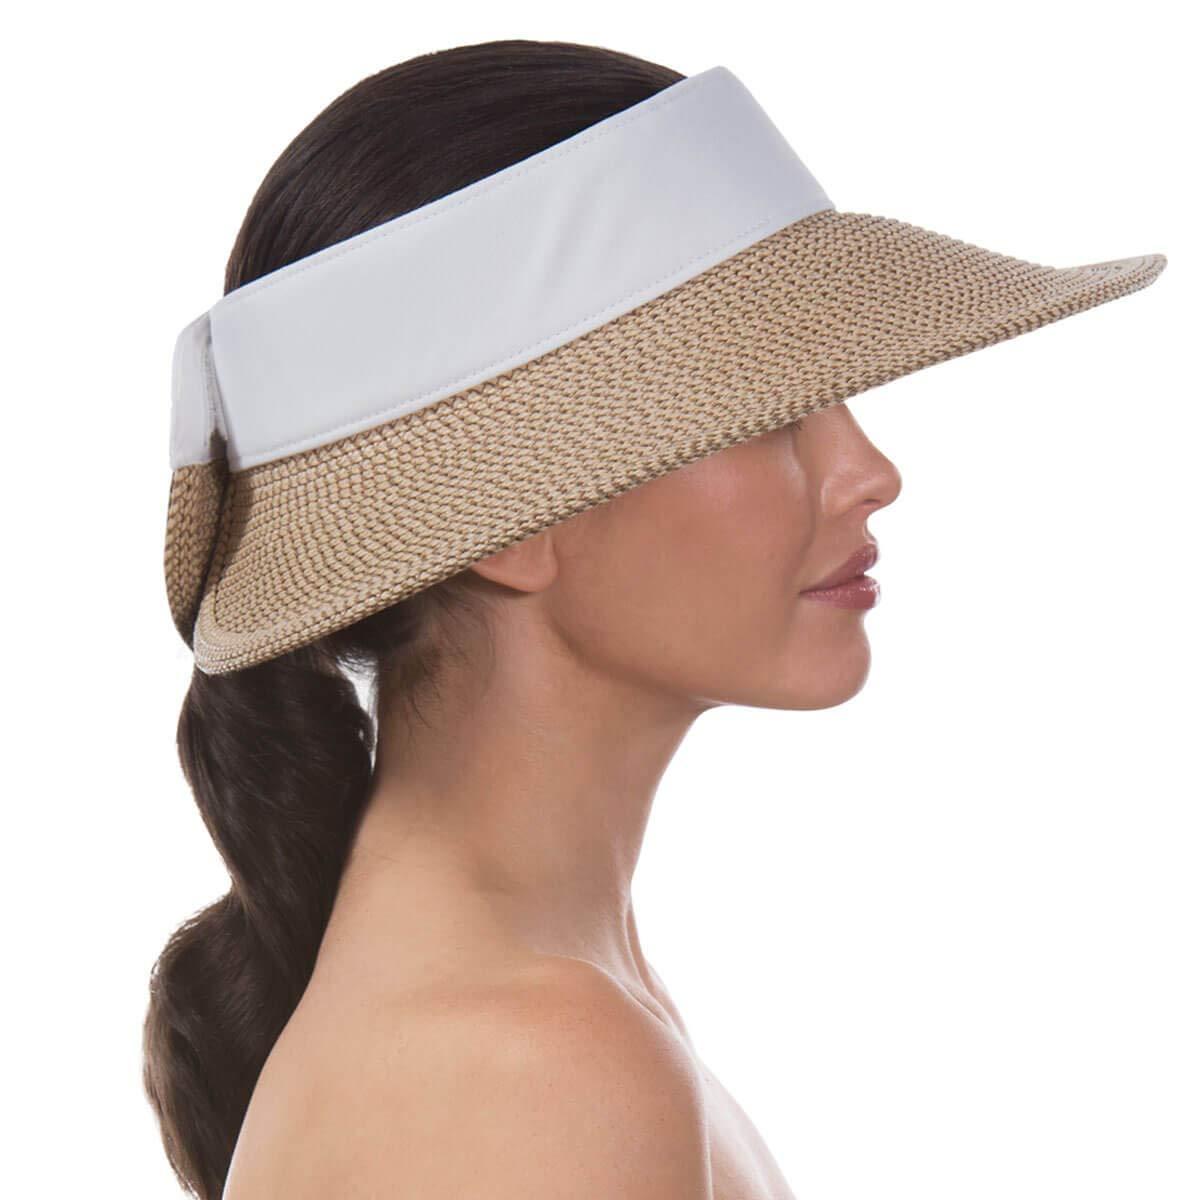 Eric Javits Luxury Women's Designer Headwear Hat - Squishee Halo - Peanut/White by Eric Javits (Image #4)